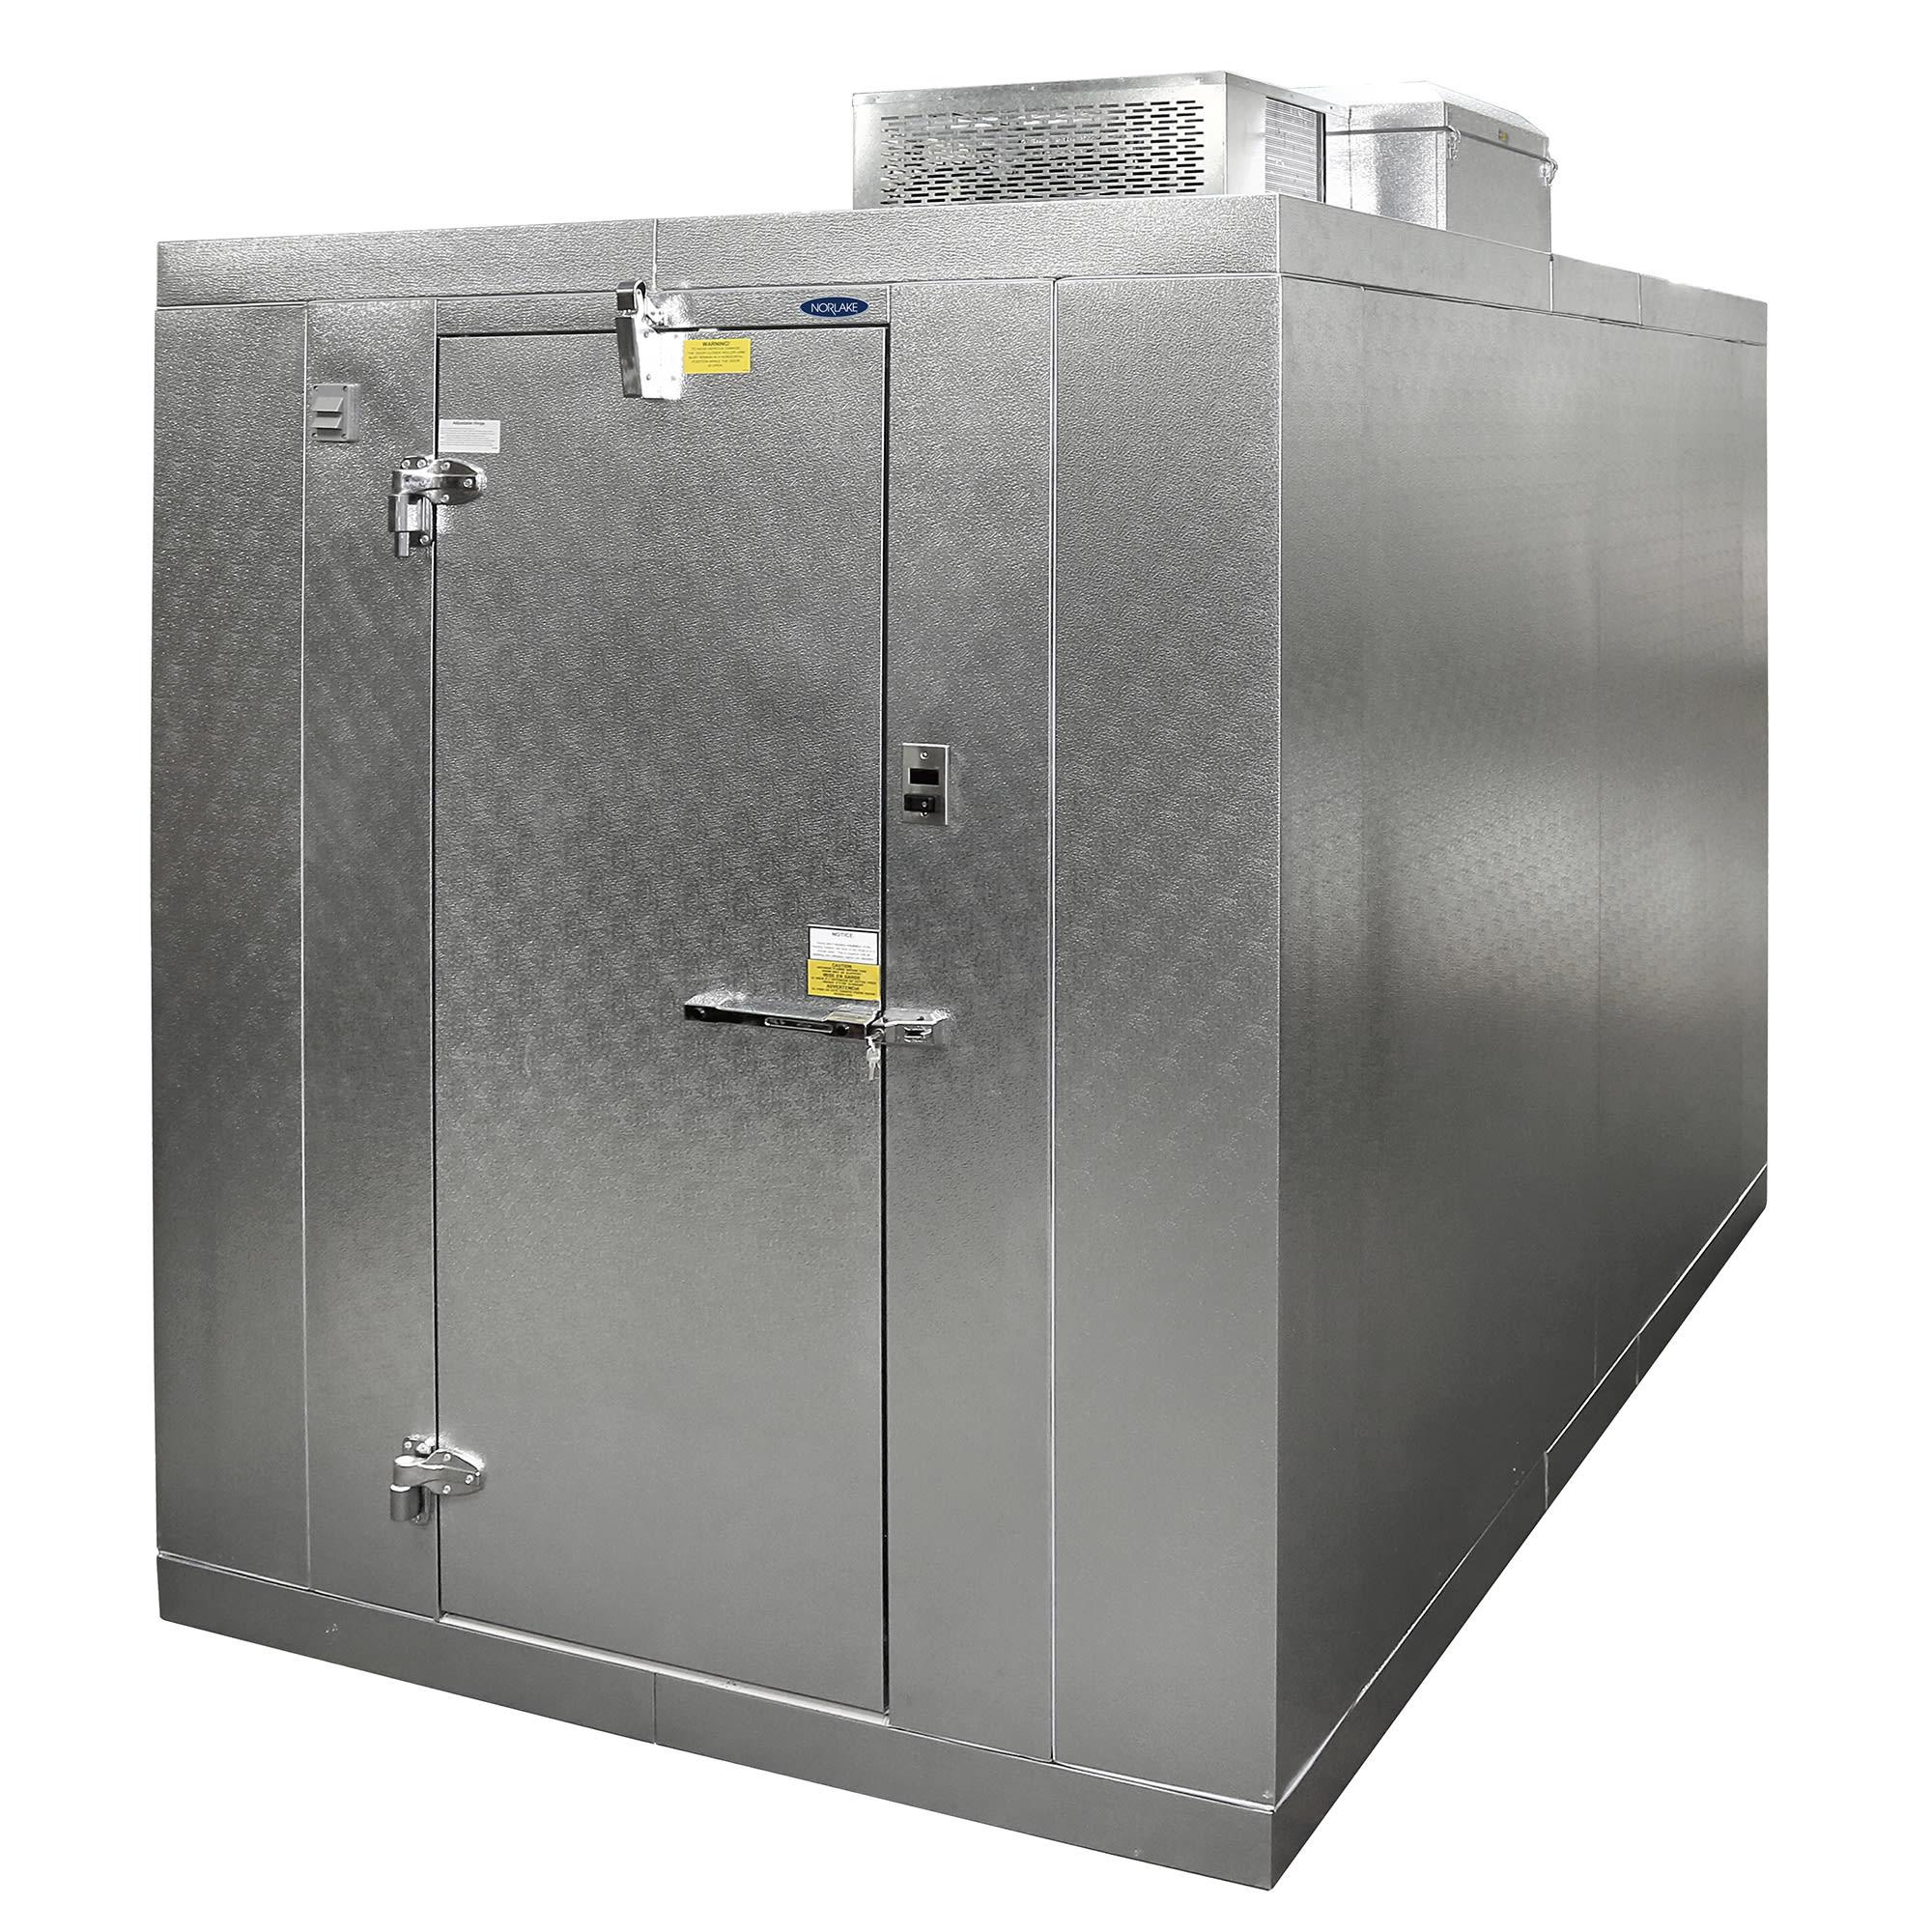 Nor-Lake KLB77812-C R Indoor Walk-In Refrigerator w/ Top ...